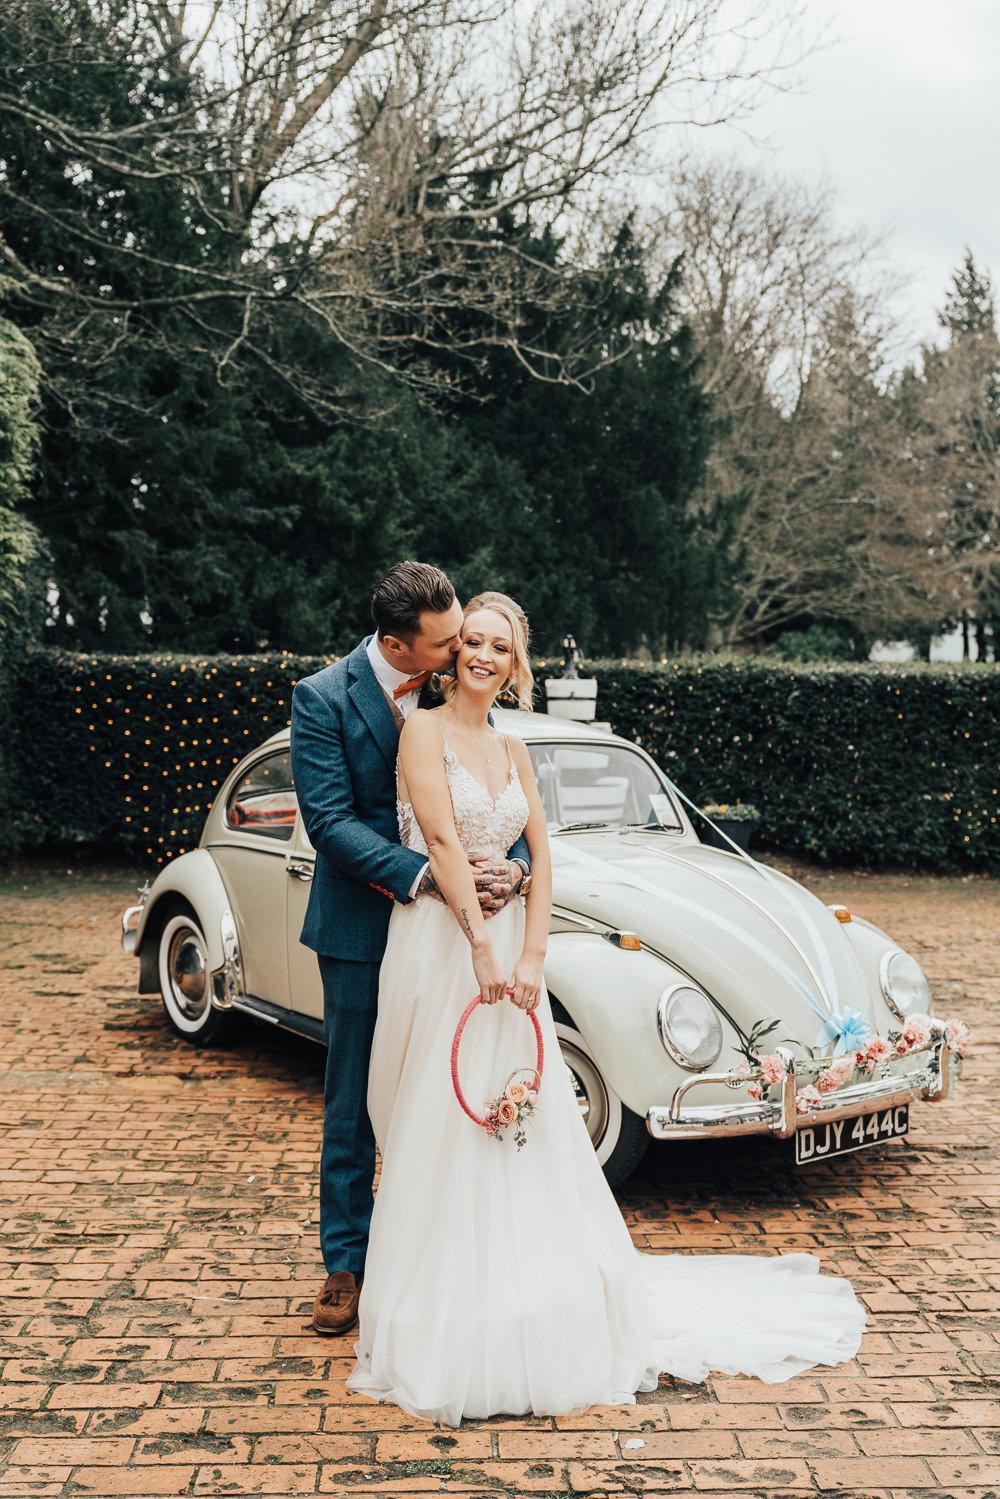 VW Beetle Car Transport Hoop Wedding Ideas Rebecca Carpenter Photography